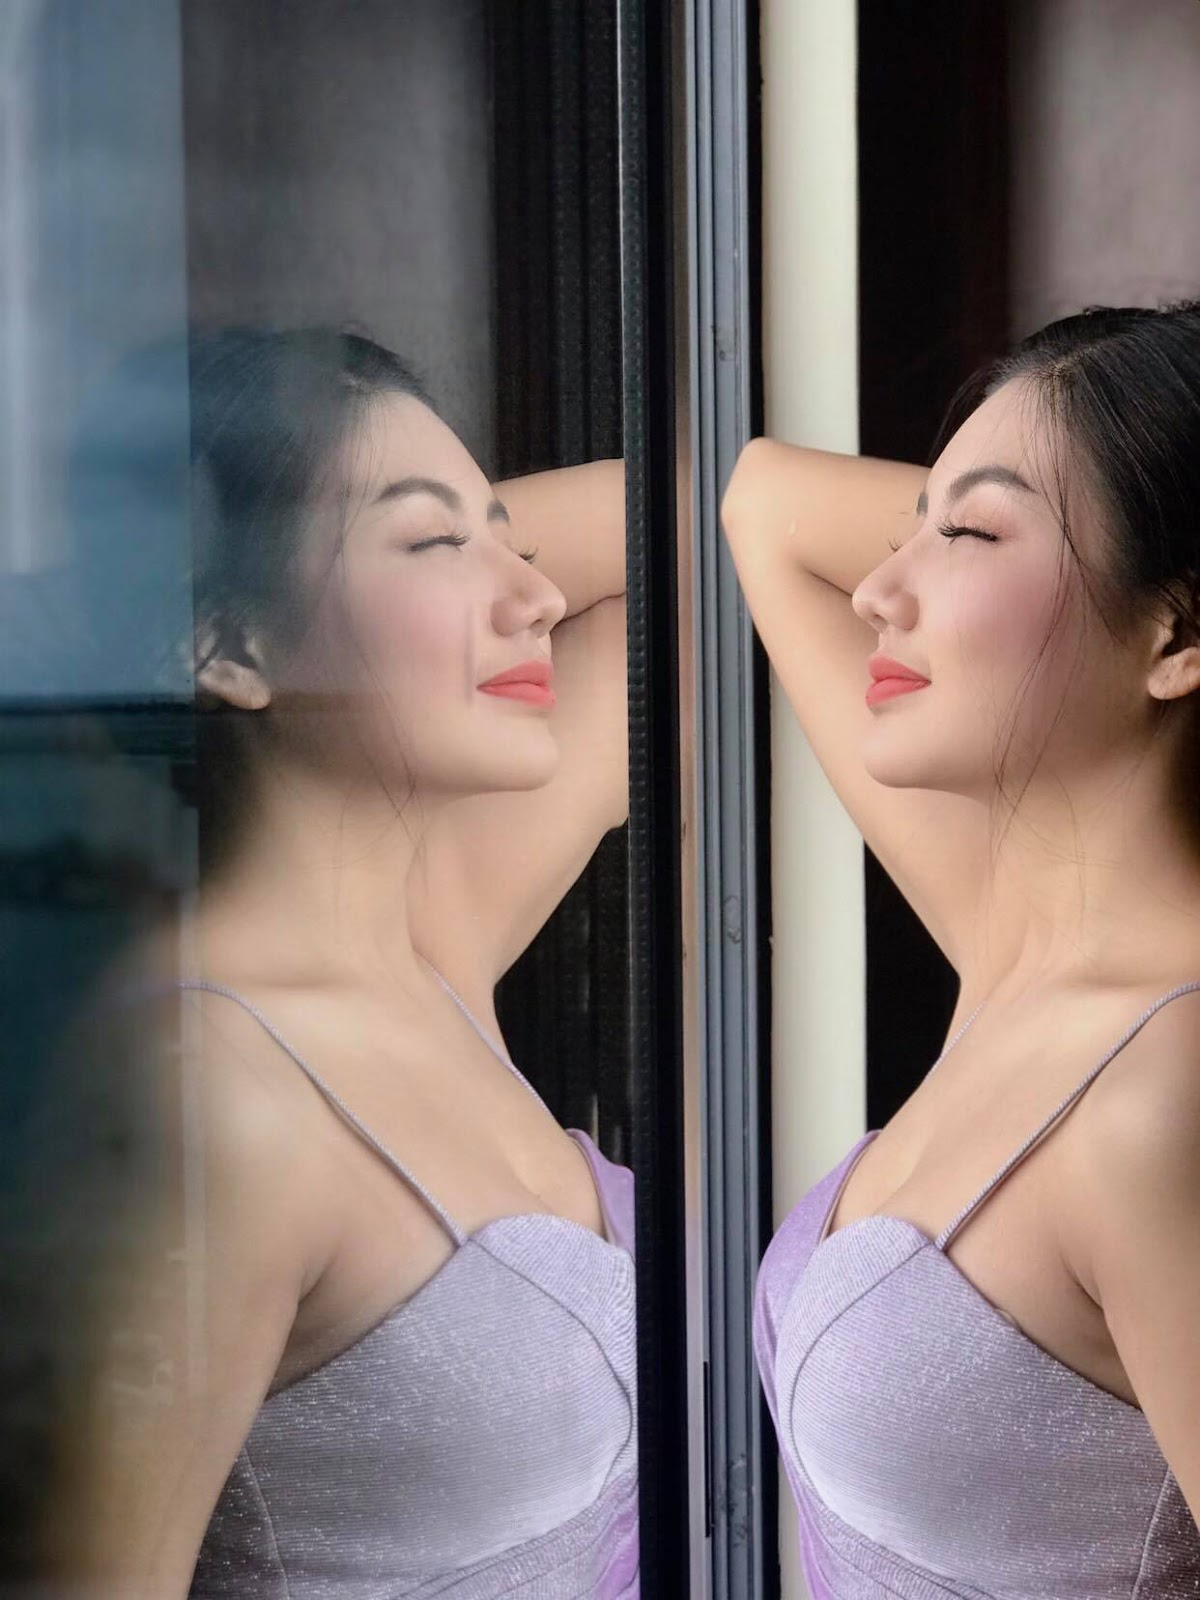 myanmarmodelgirls-May Myint Mo Beautiful Snap Photos